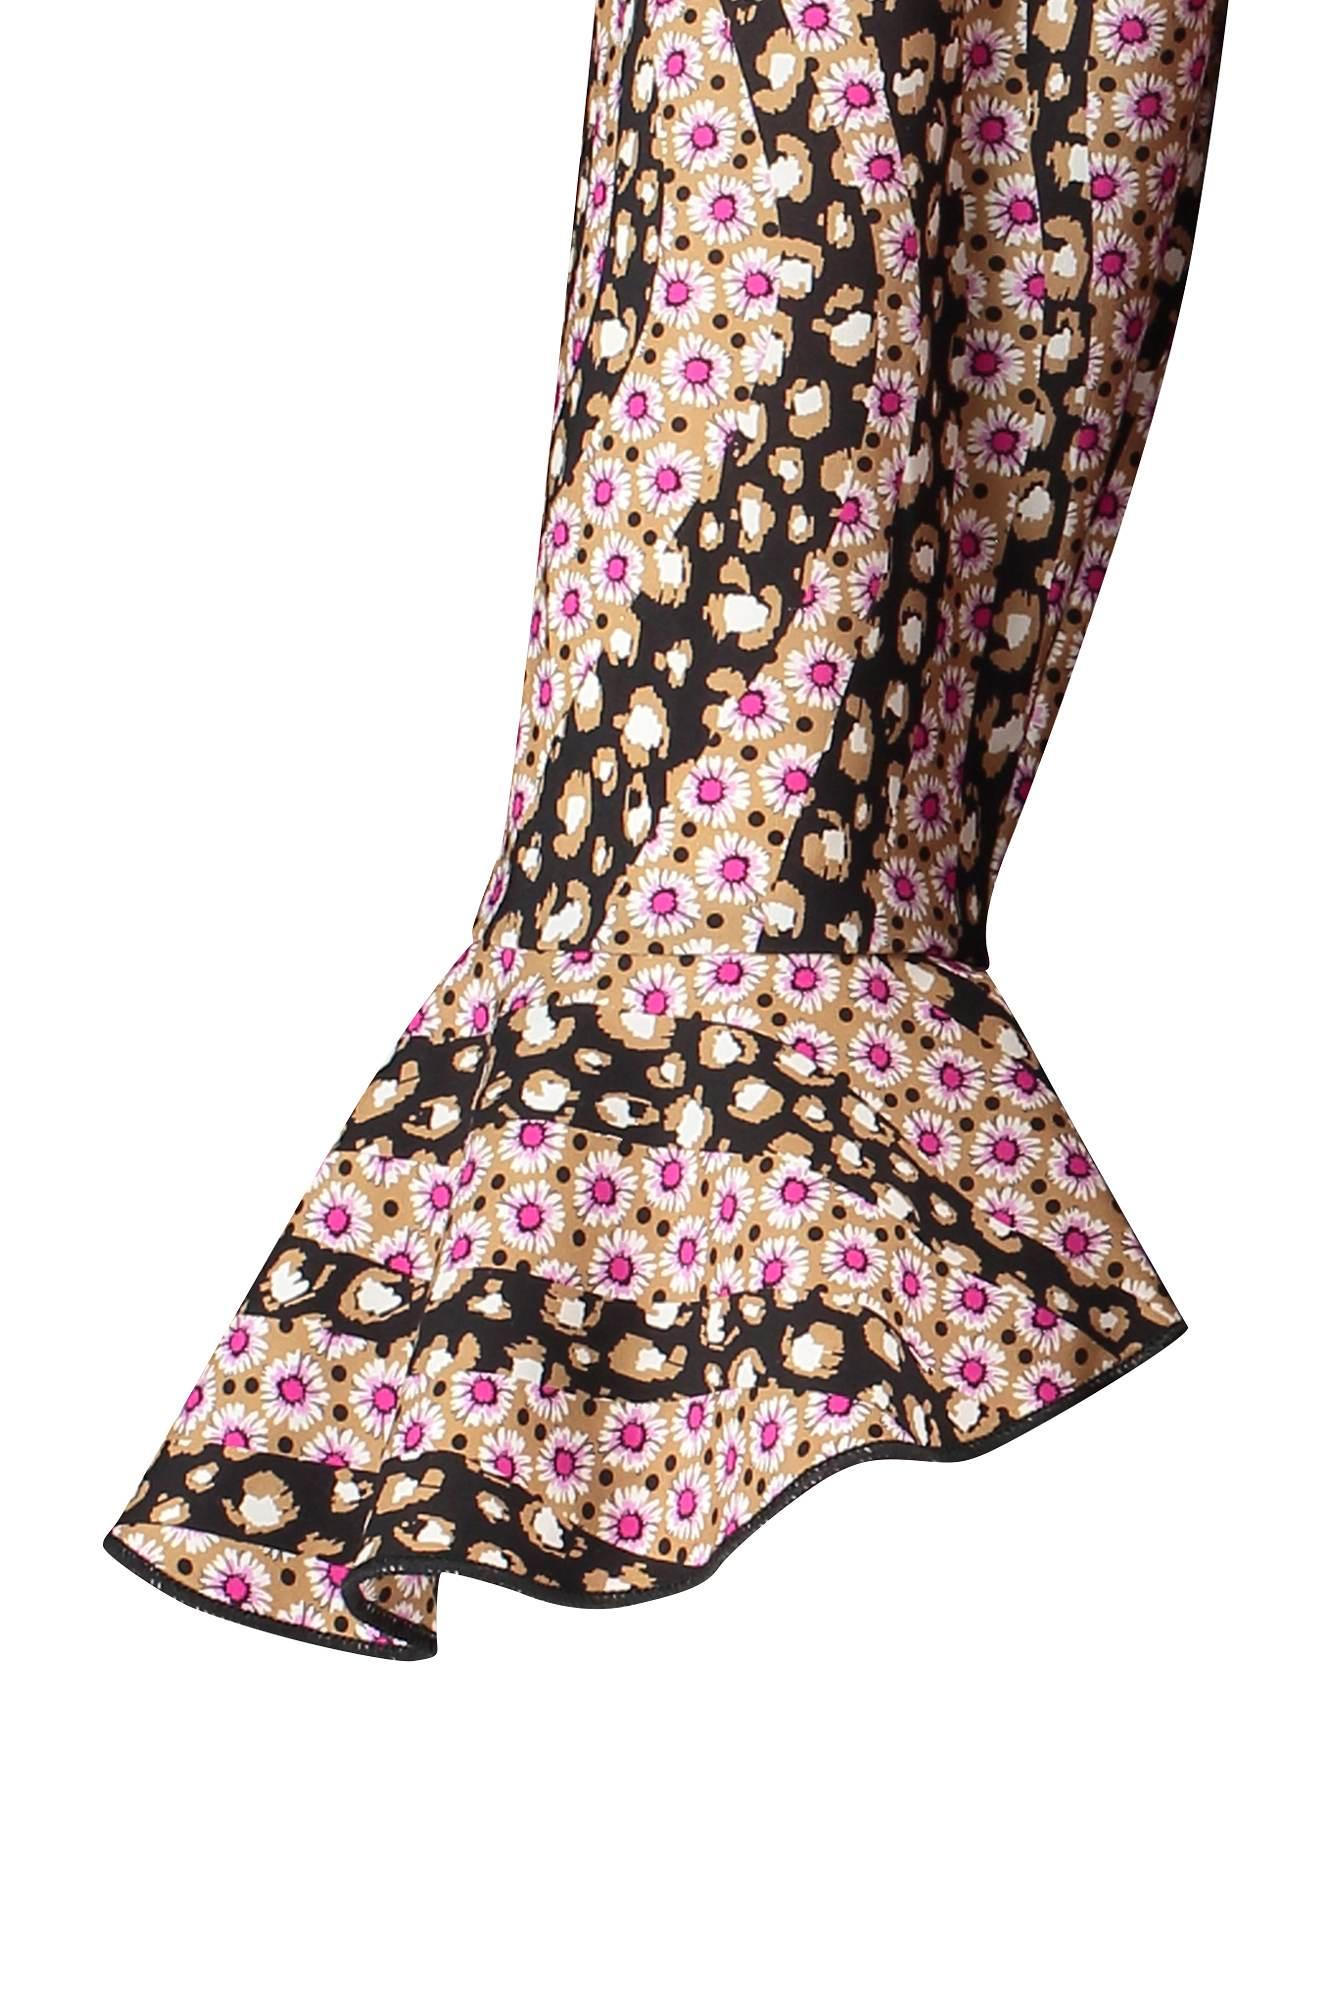 Adrianne leo flower blouse